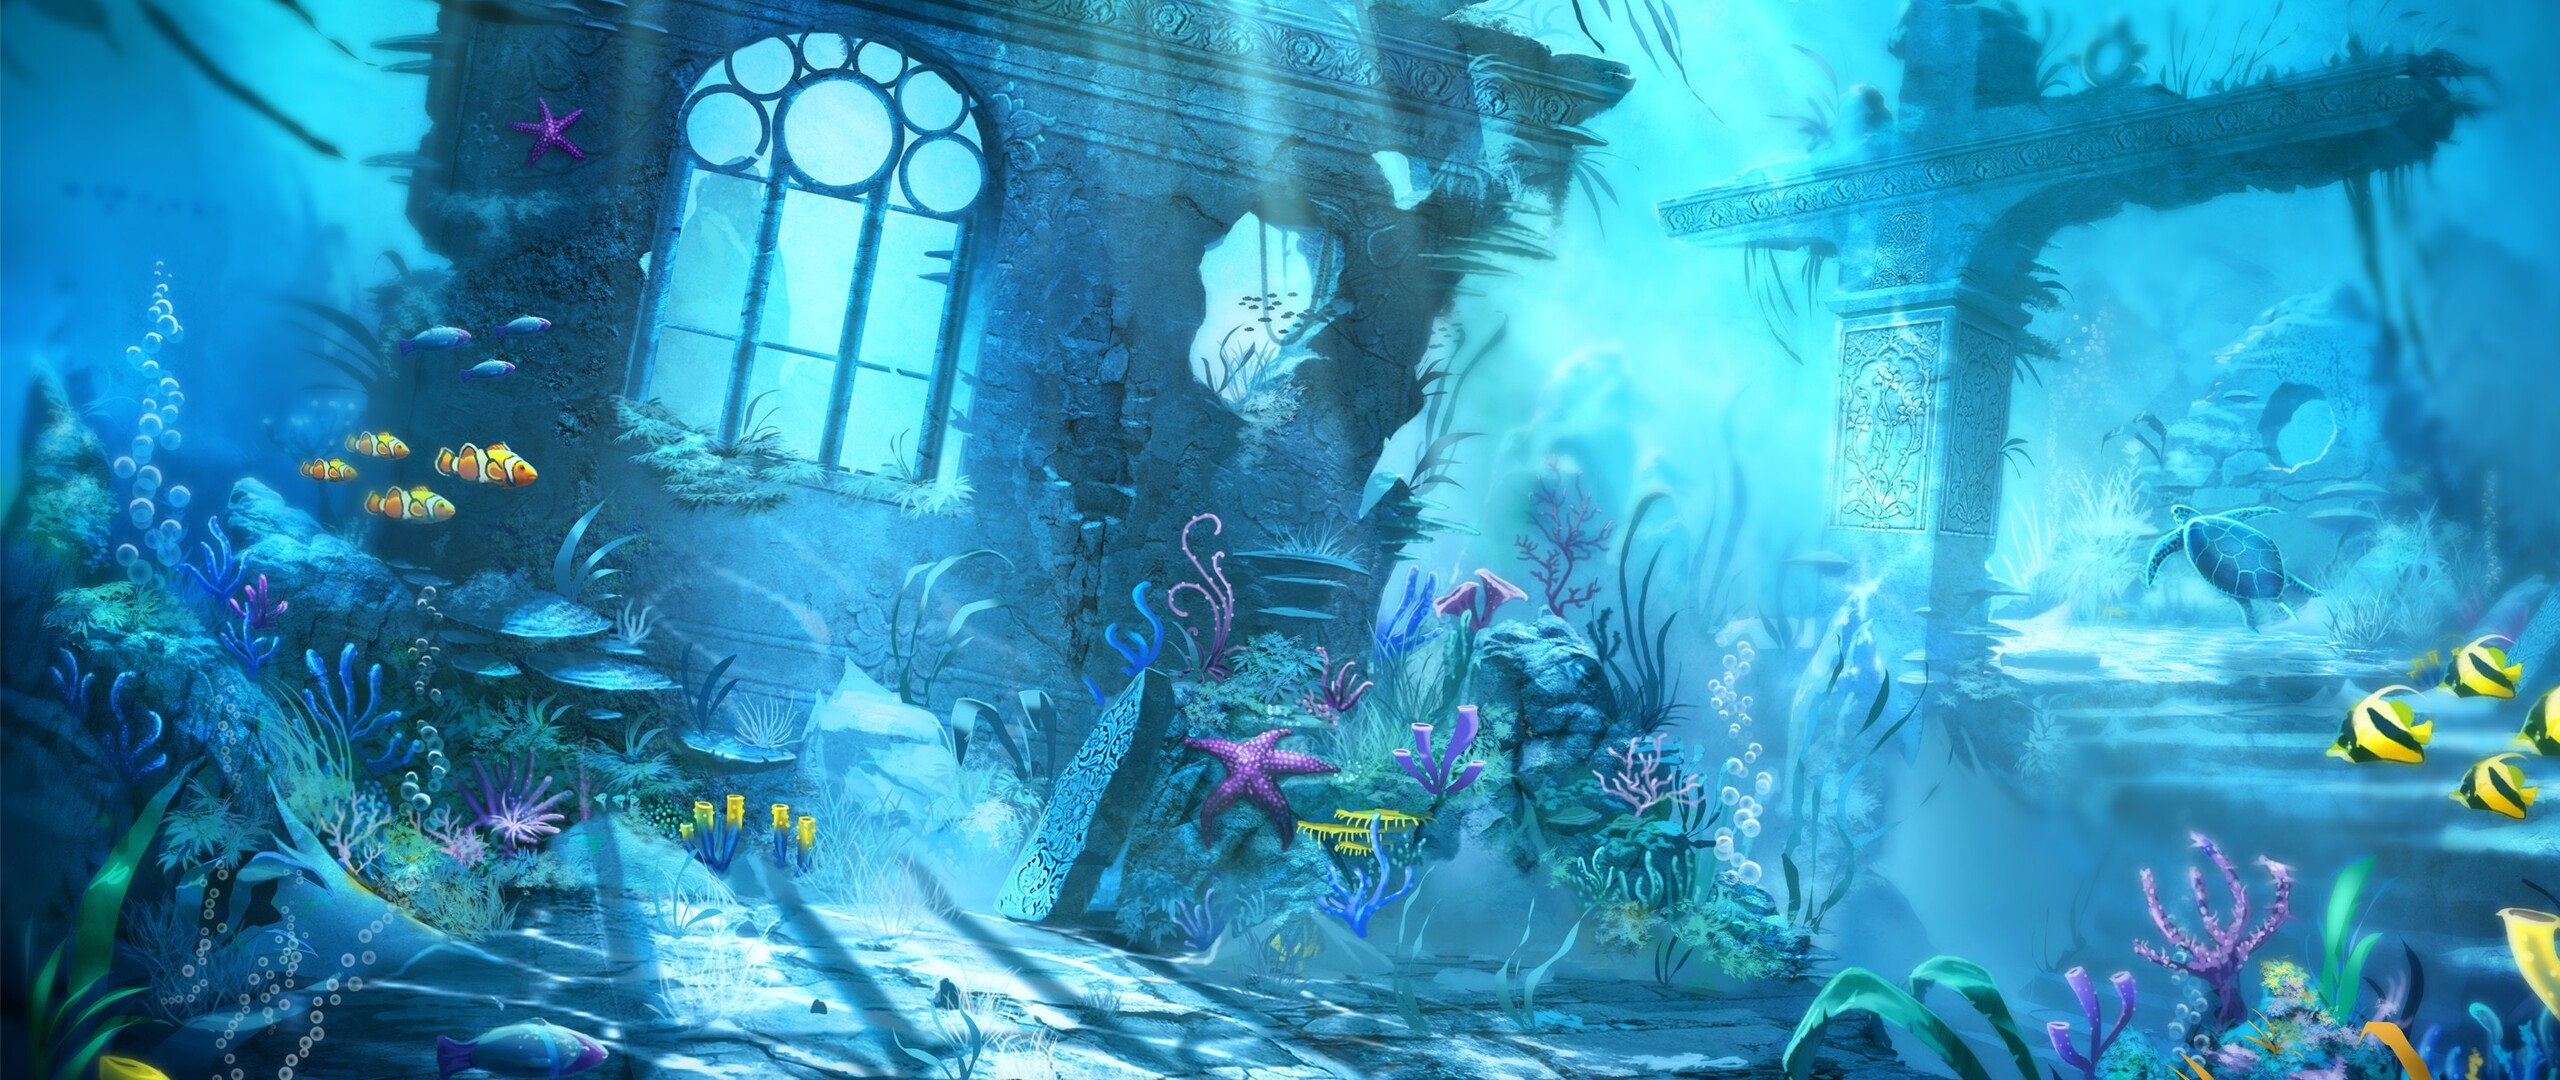 underwater-scene.jpg